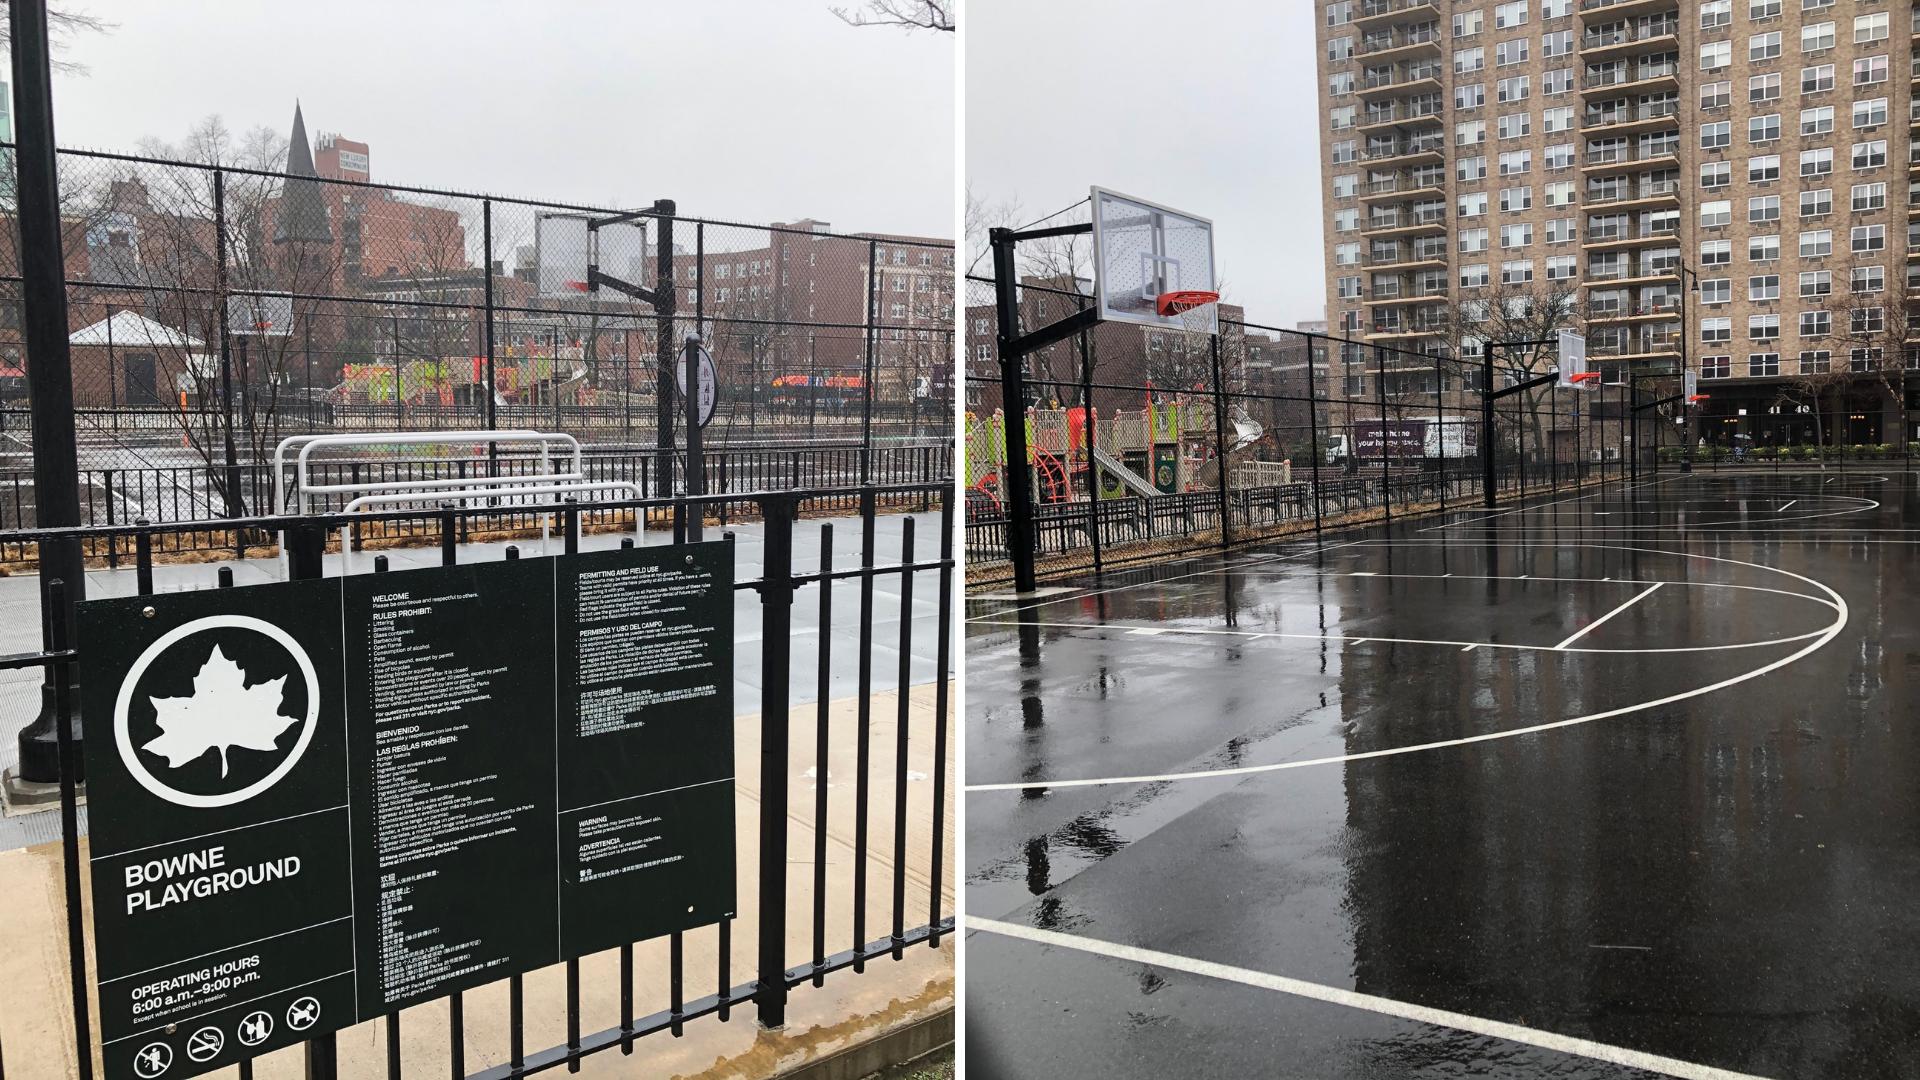 Bowne Playground basketball court